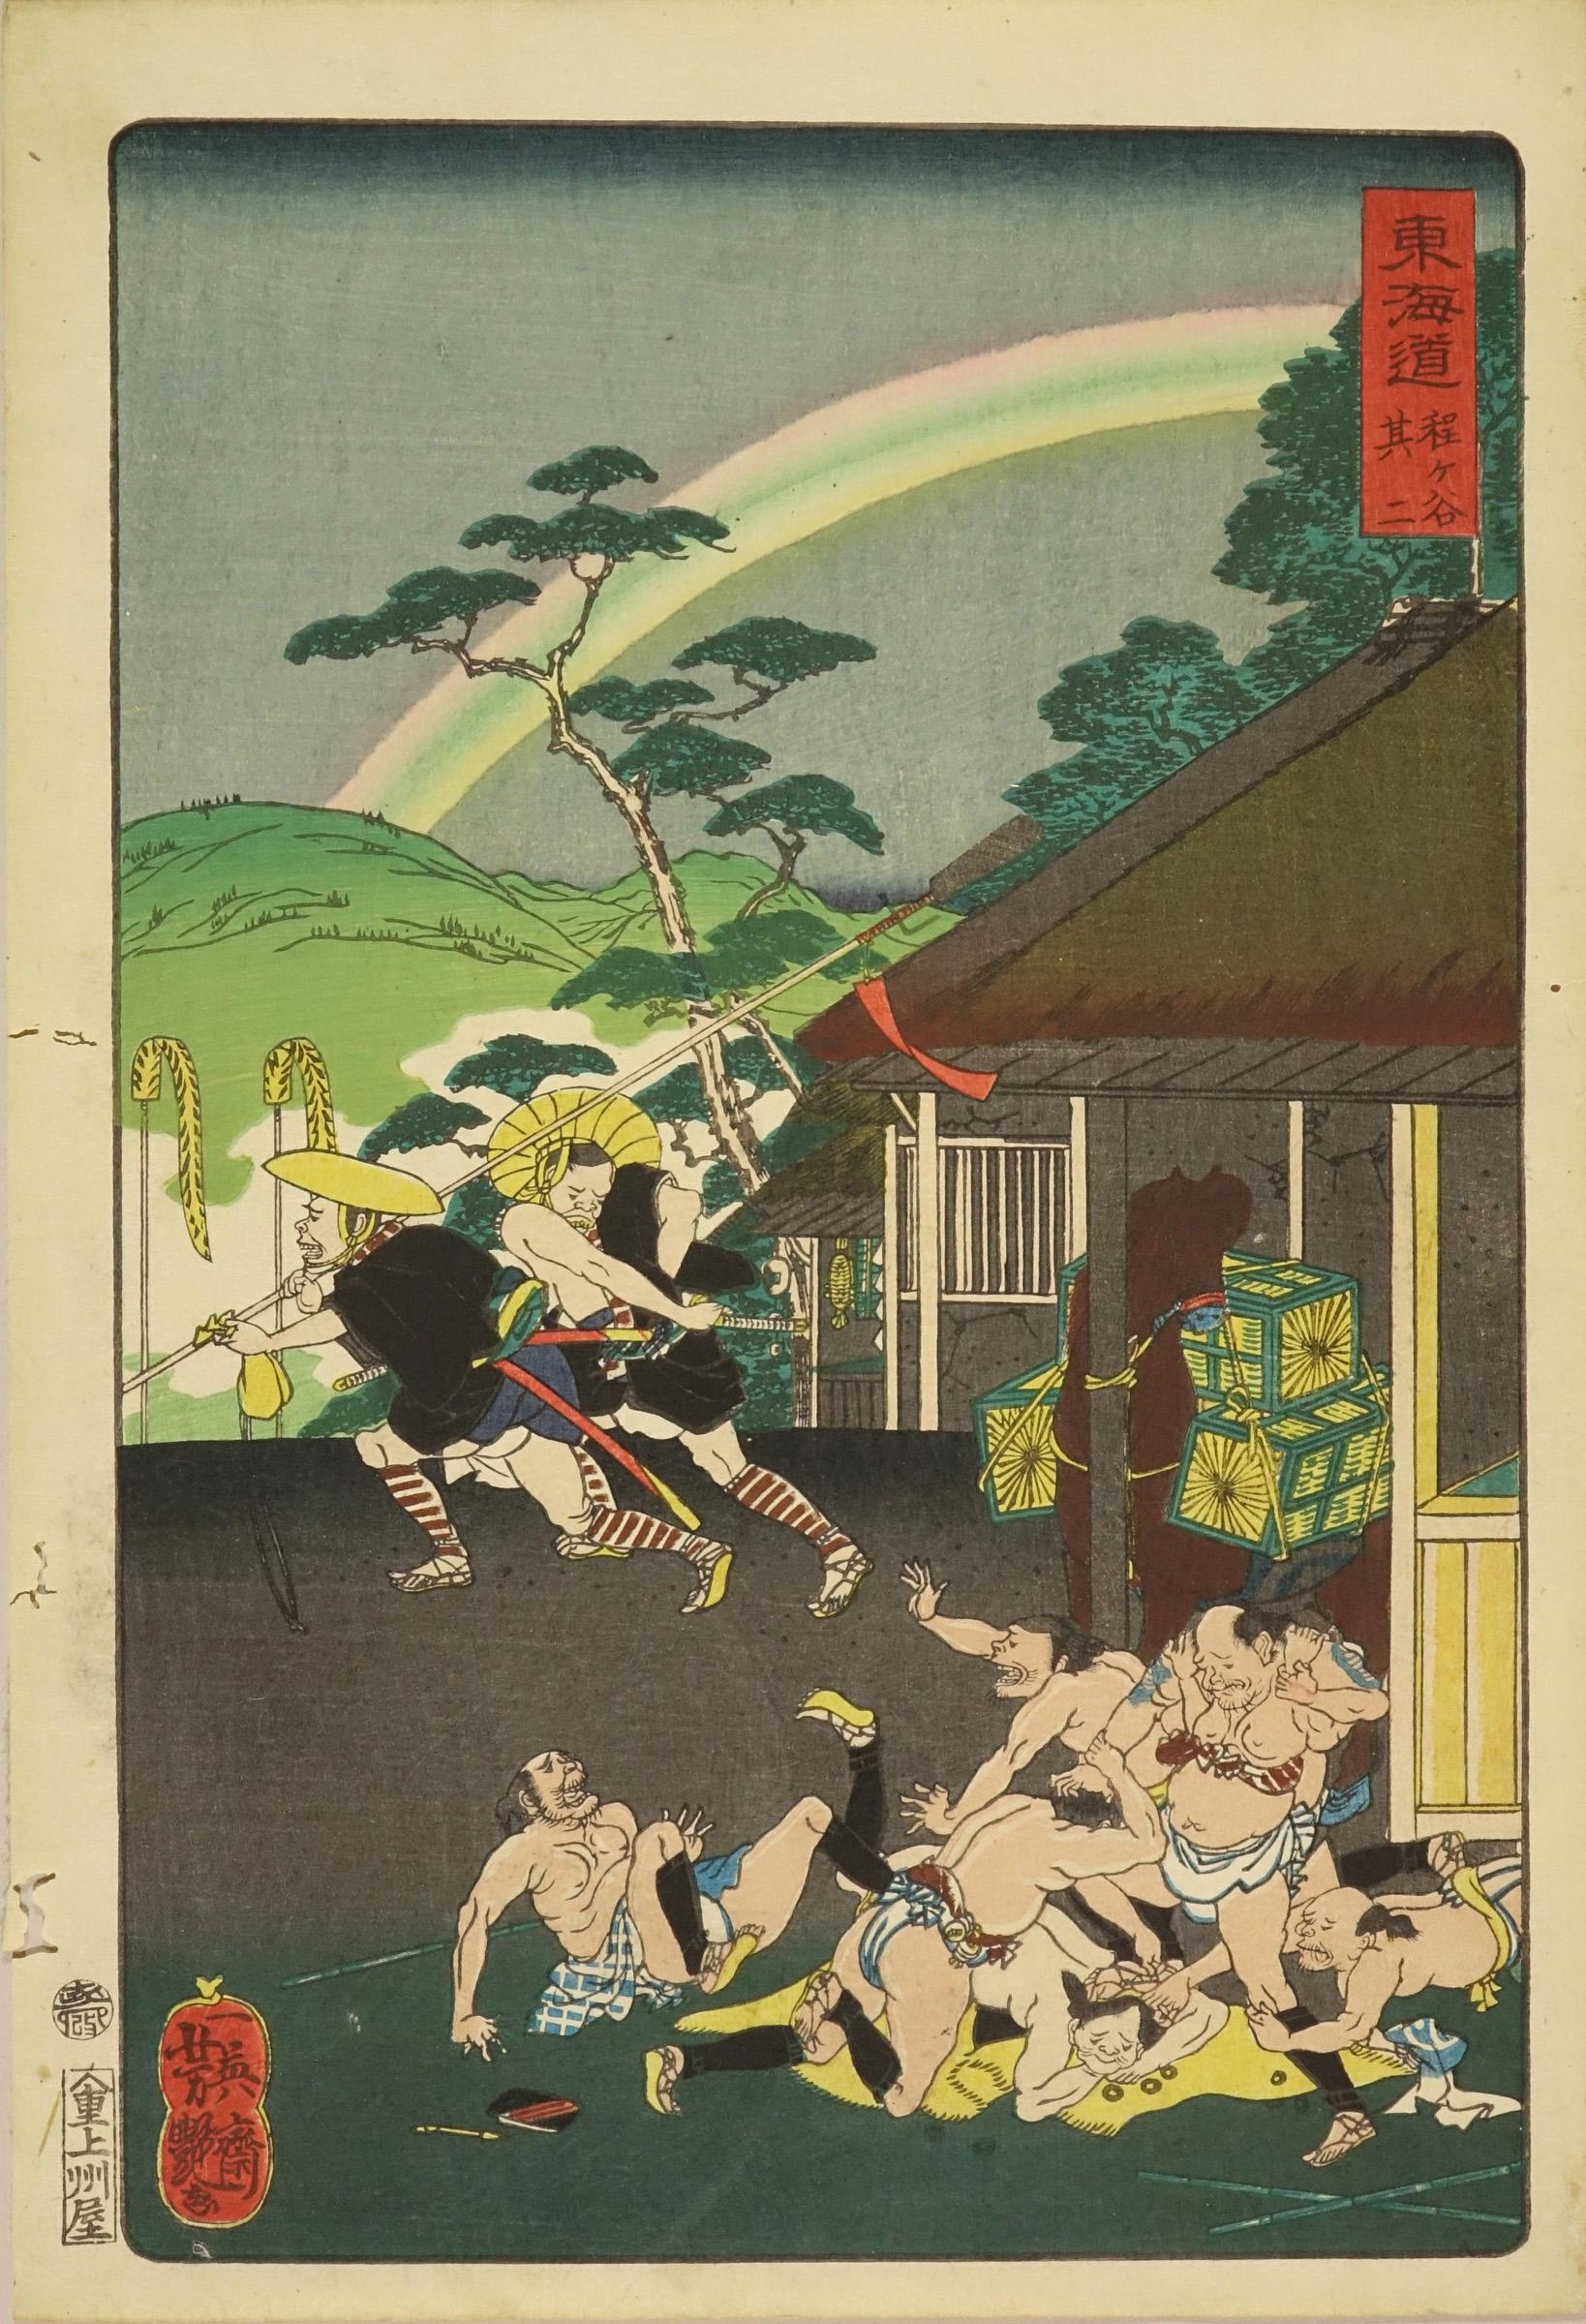 YOSHITSUYA Hodogaya, from <i>Tokaido</i> ([the Fifty-three stations of the] Tokaido) (the 'procession' Tokaido)